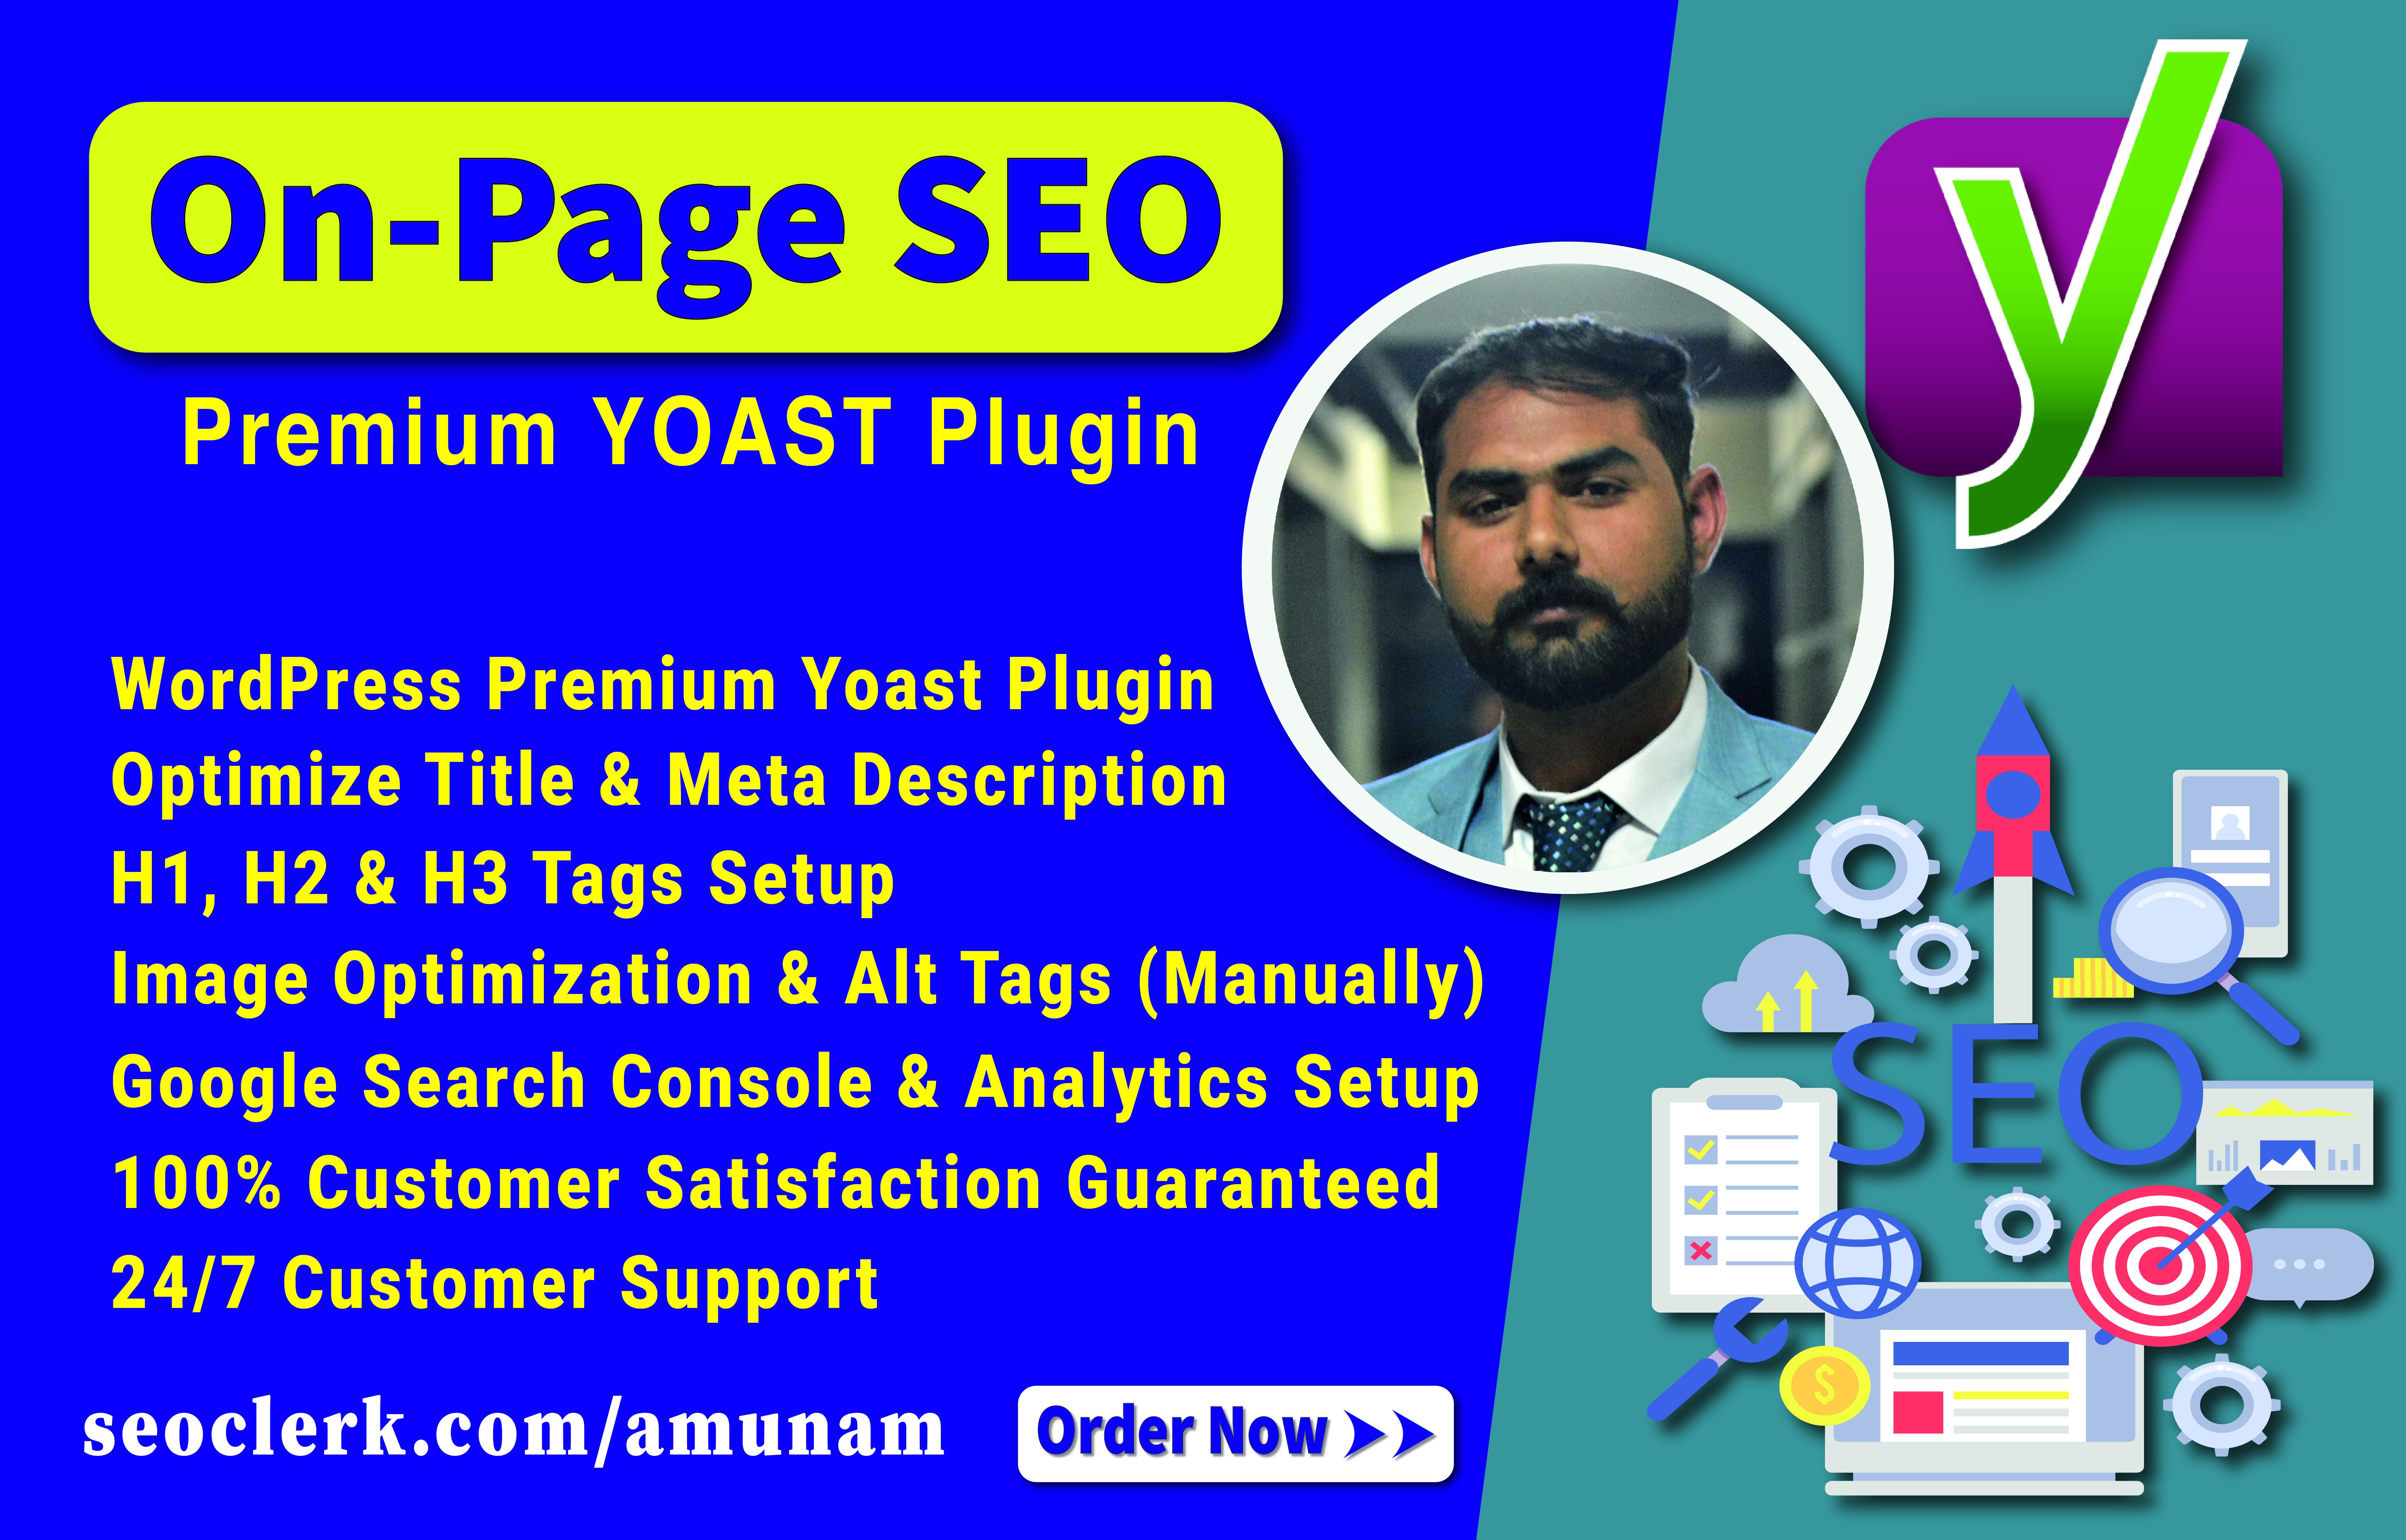 I will do onpage seo with premium yoast plugin